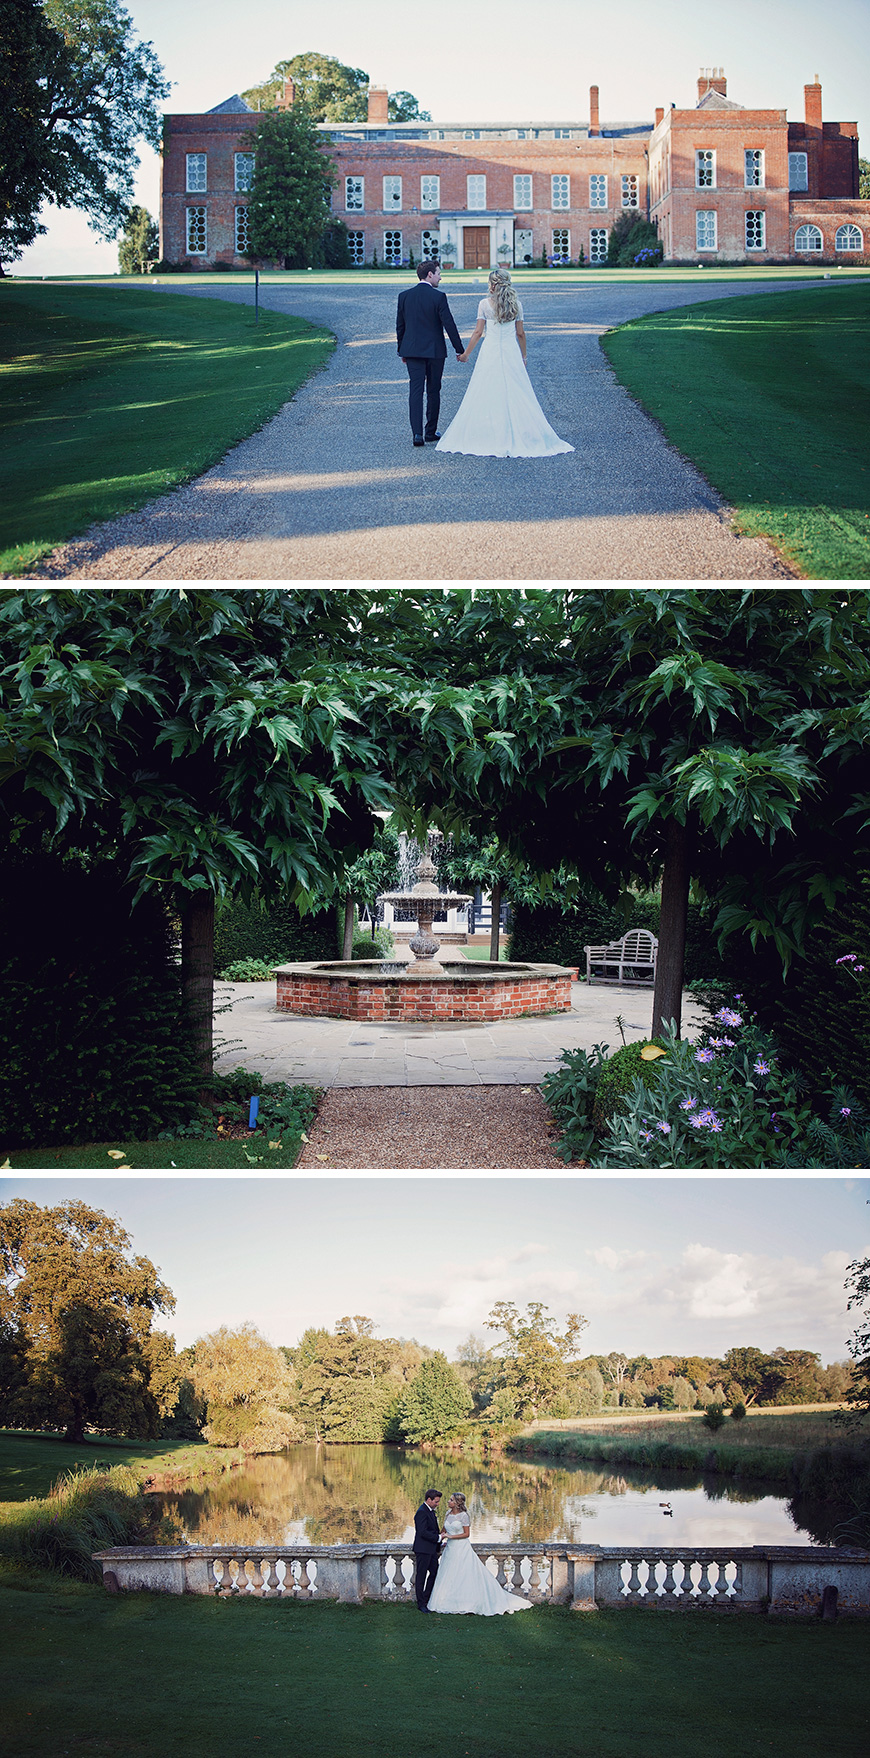 Real Wedding - Summer Elegance at Braxted Park